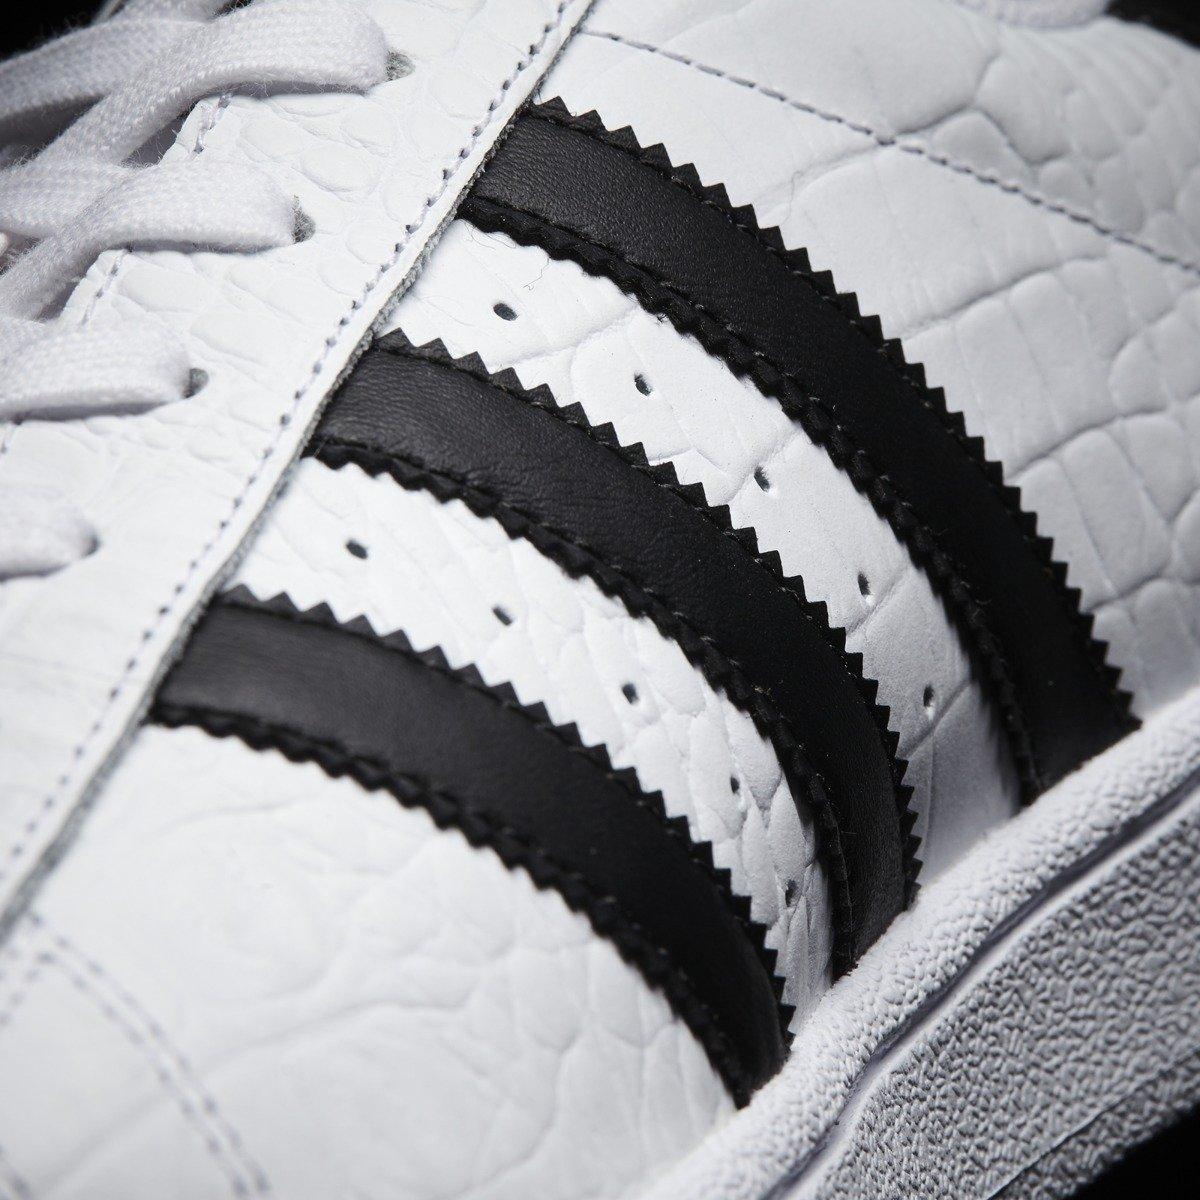 Adidas Print Superstar Originals Chaussures Bz0198 Animal jpGzVqUMLS